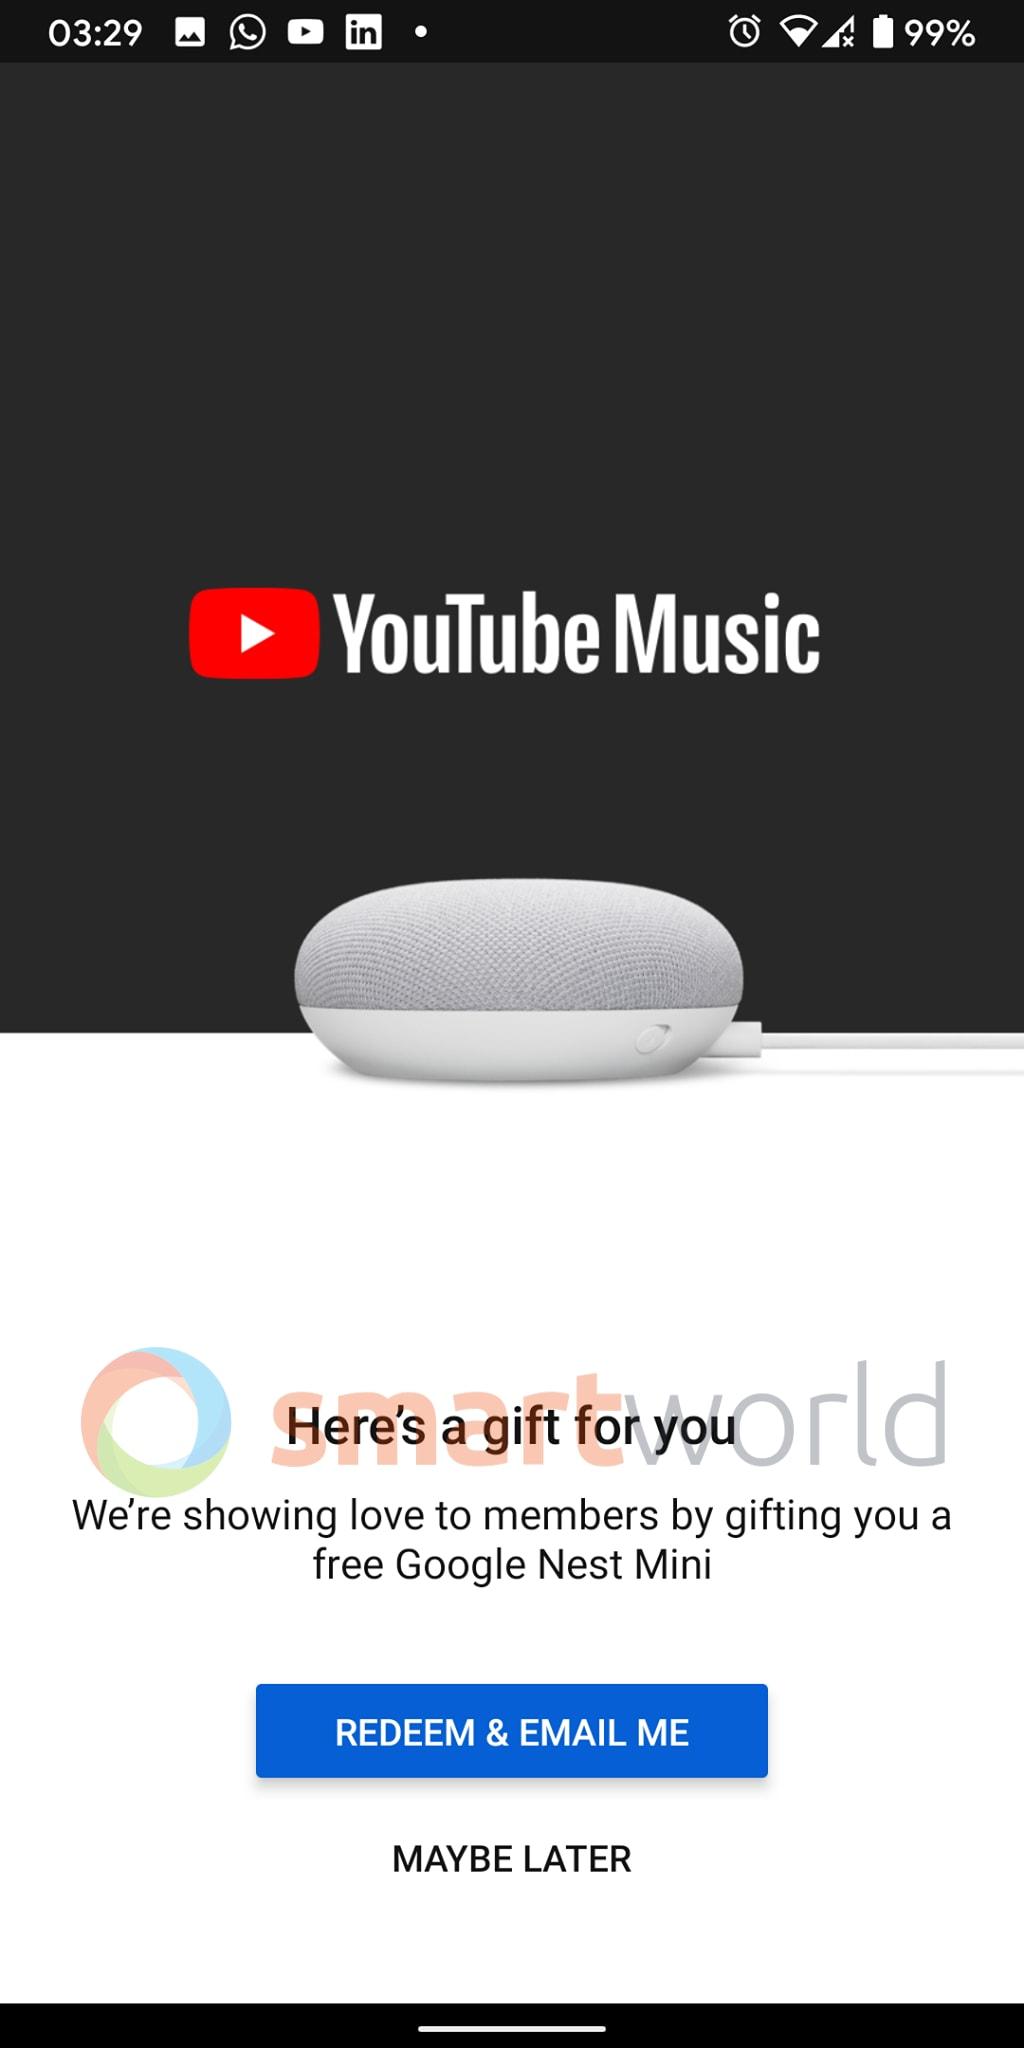 google-nest-mini-regalo-natale-abbonati-play-music-youtube-music-02